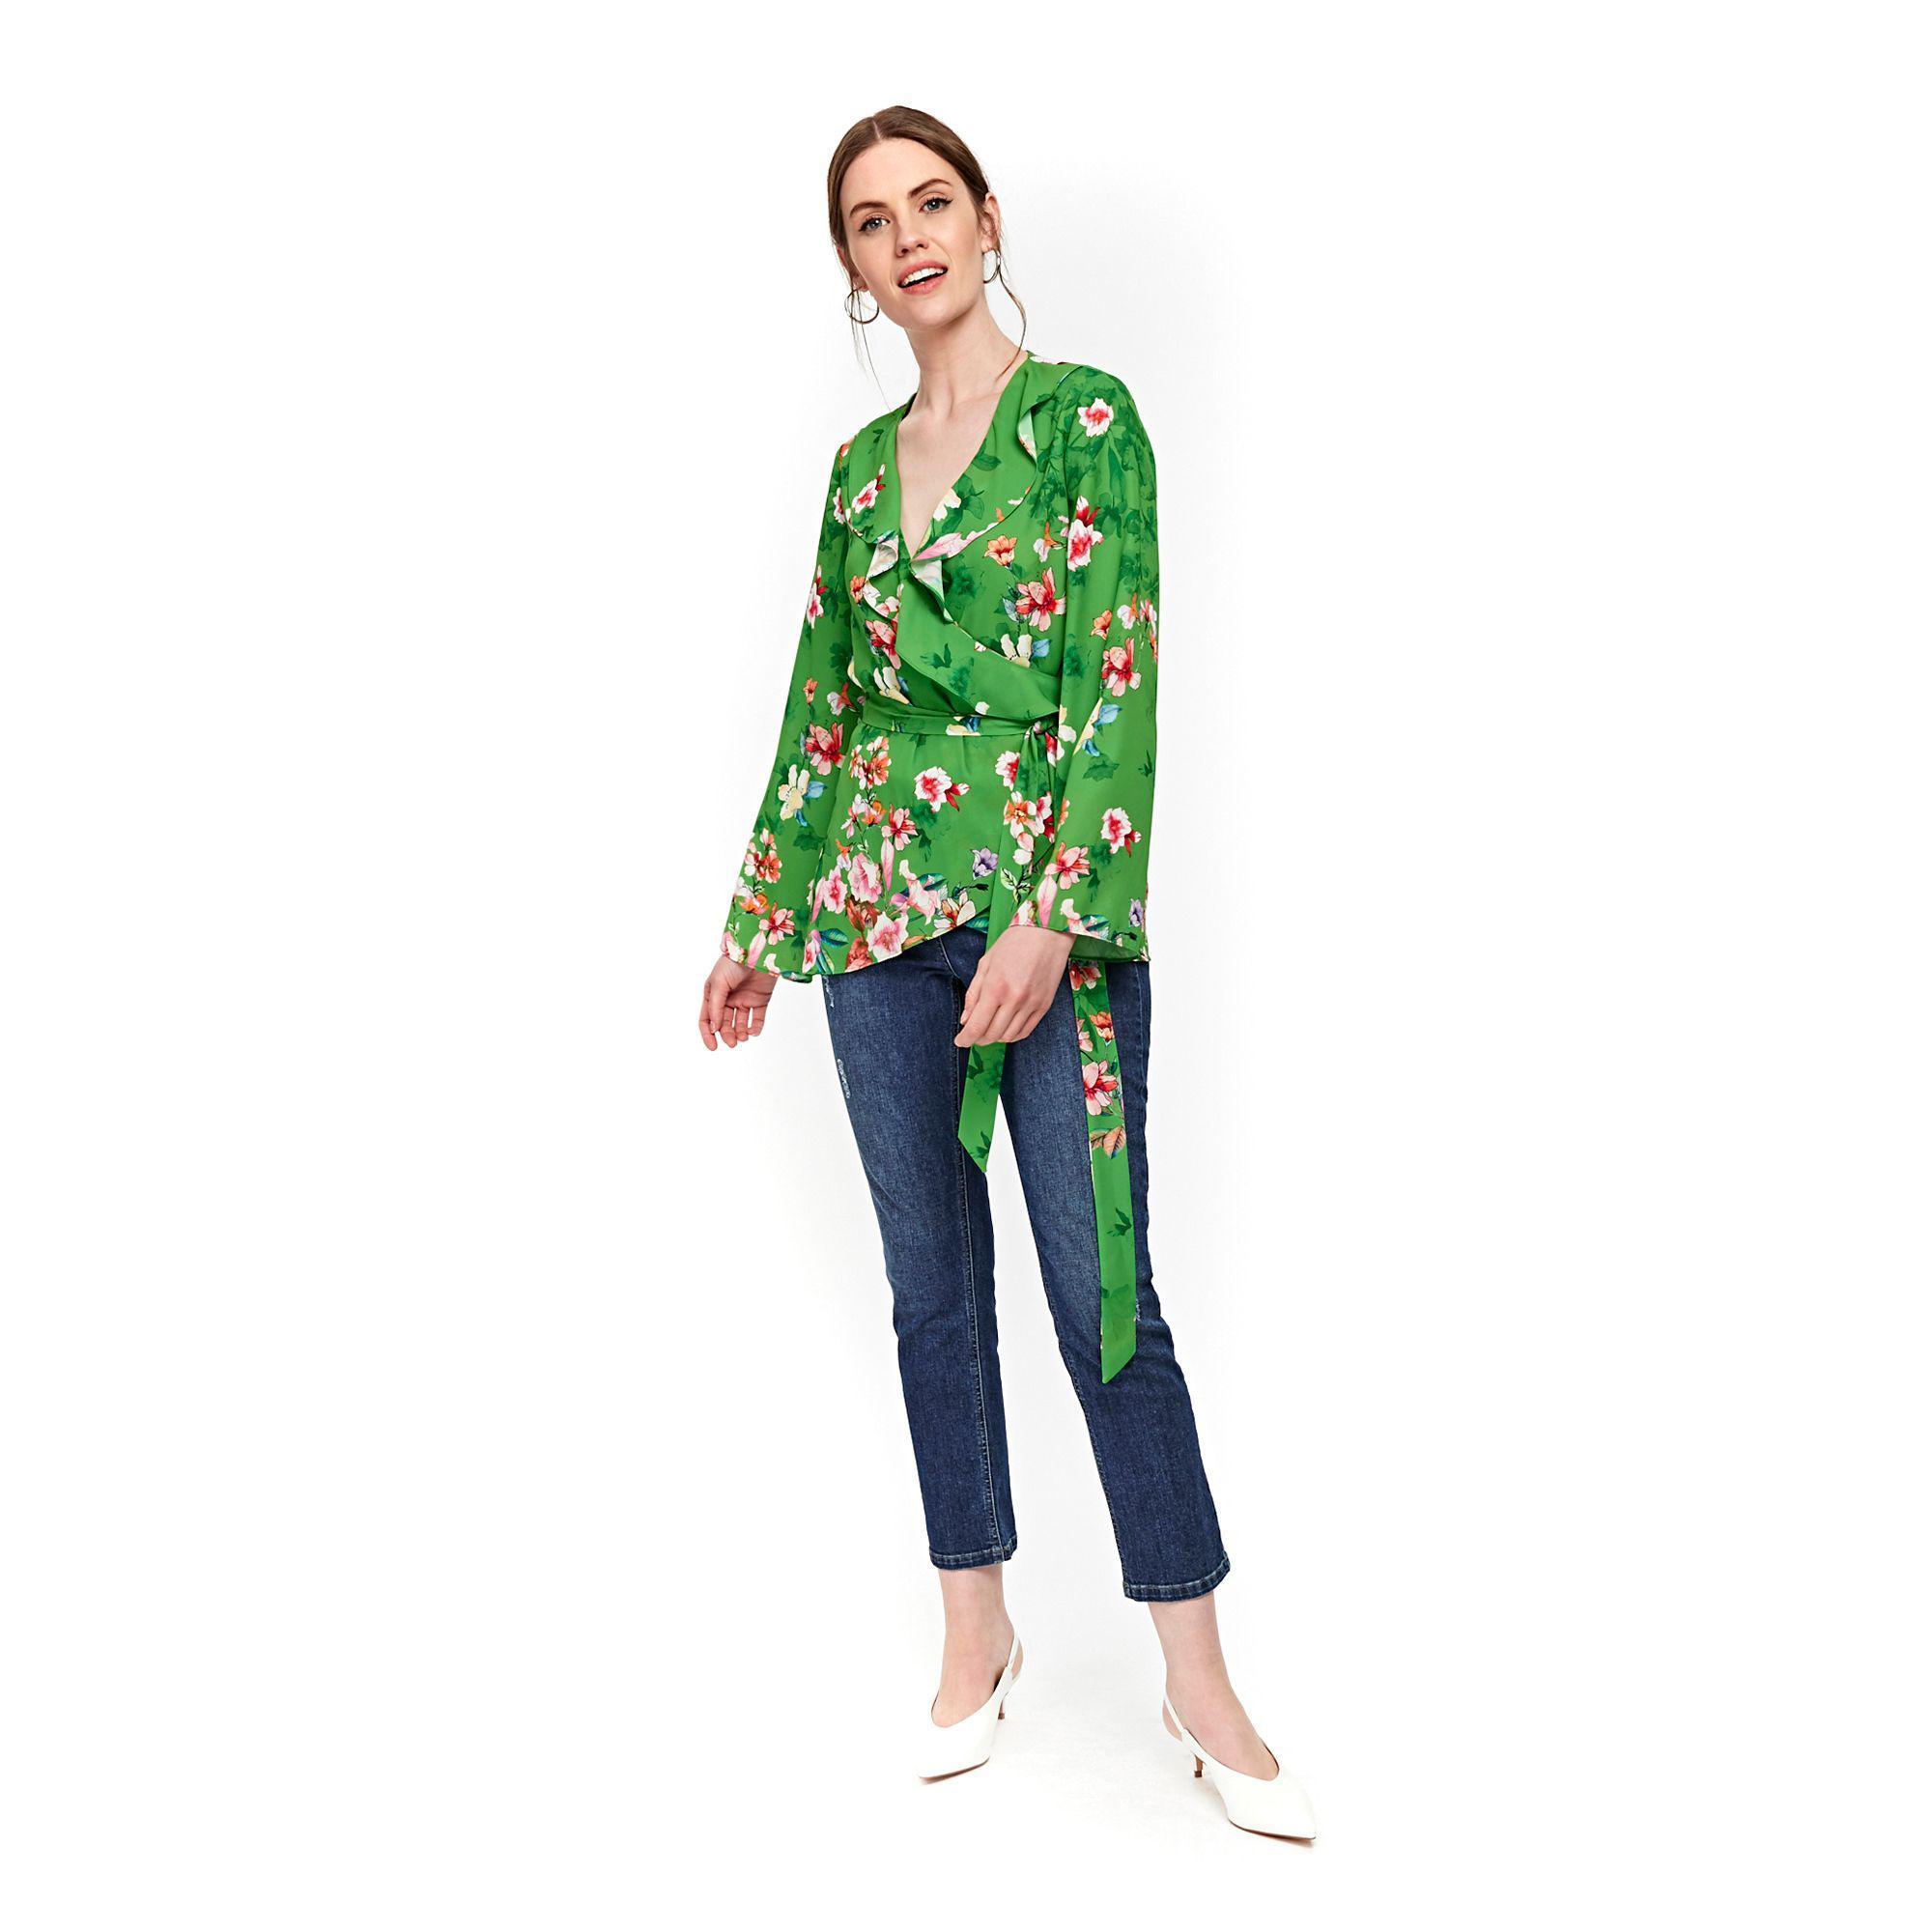 ef8f5aeed93bef Wallis Green Floral Print Wrap Top in Green - Lyst